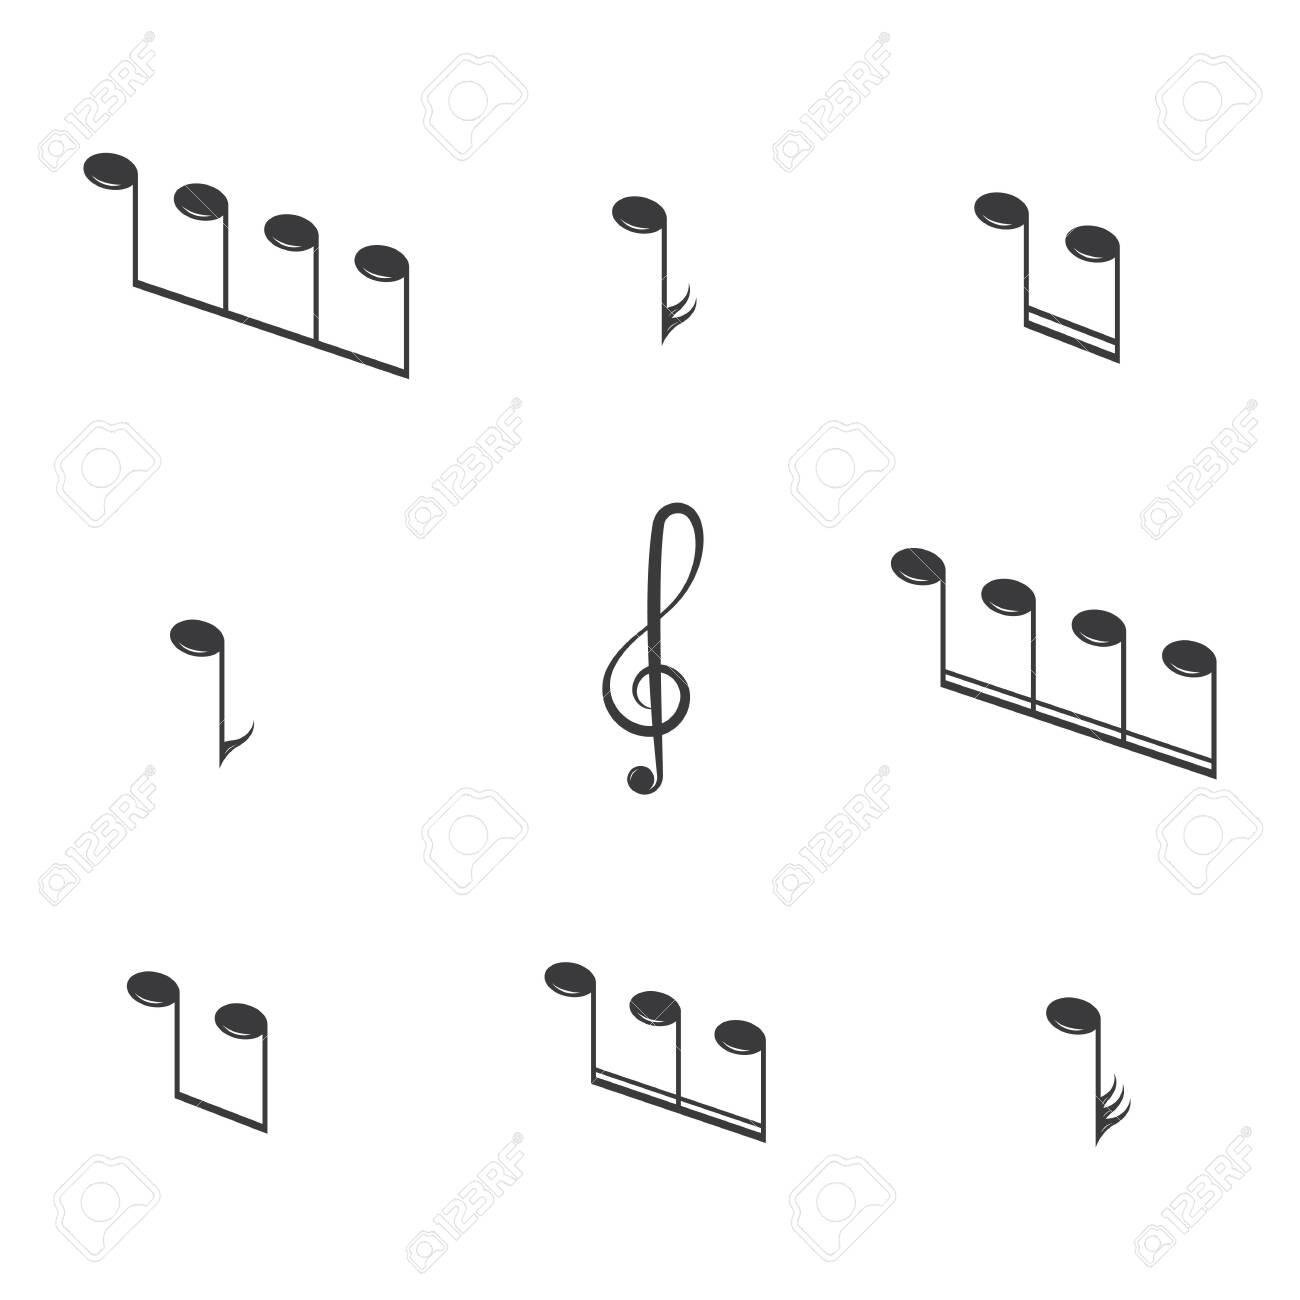 Musical design element,music notes,symbols,vector illustration. - Vector - 152524792